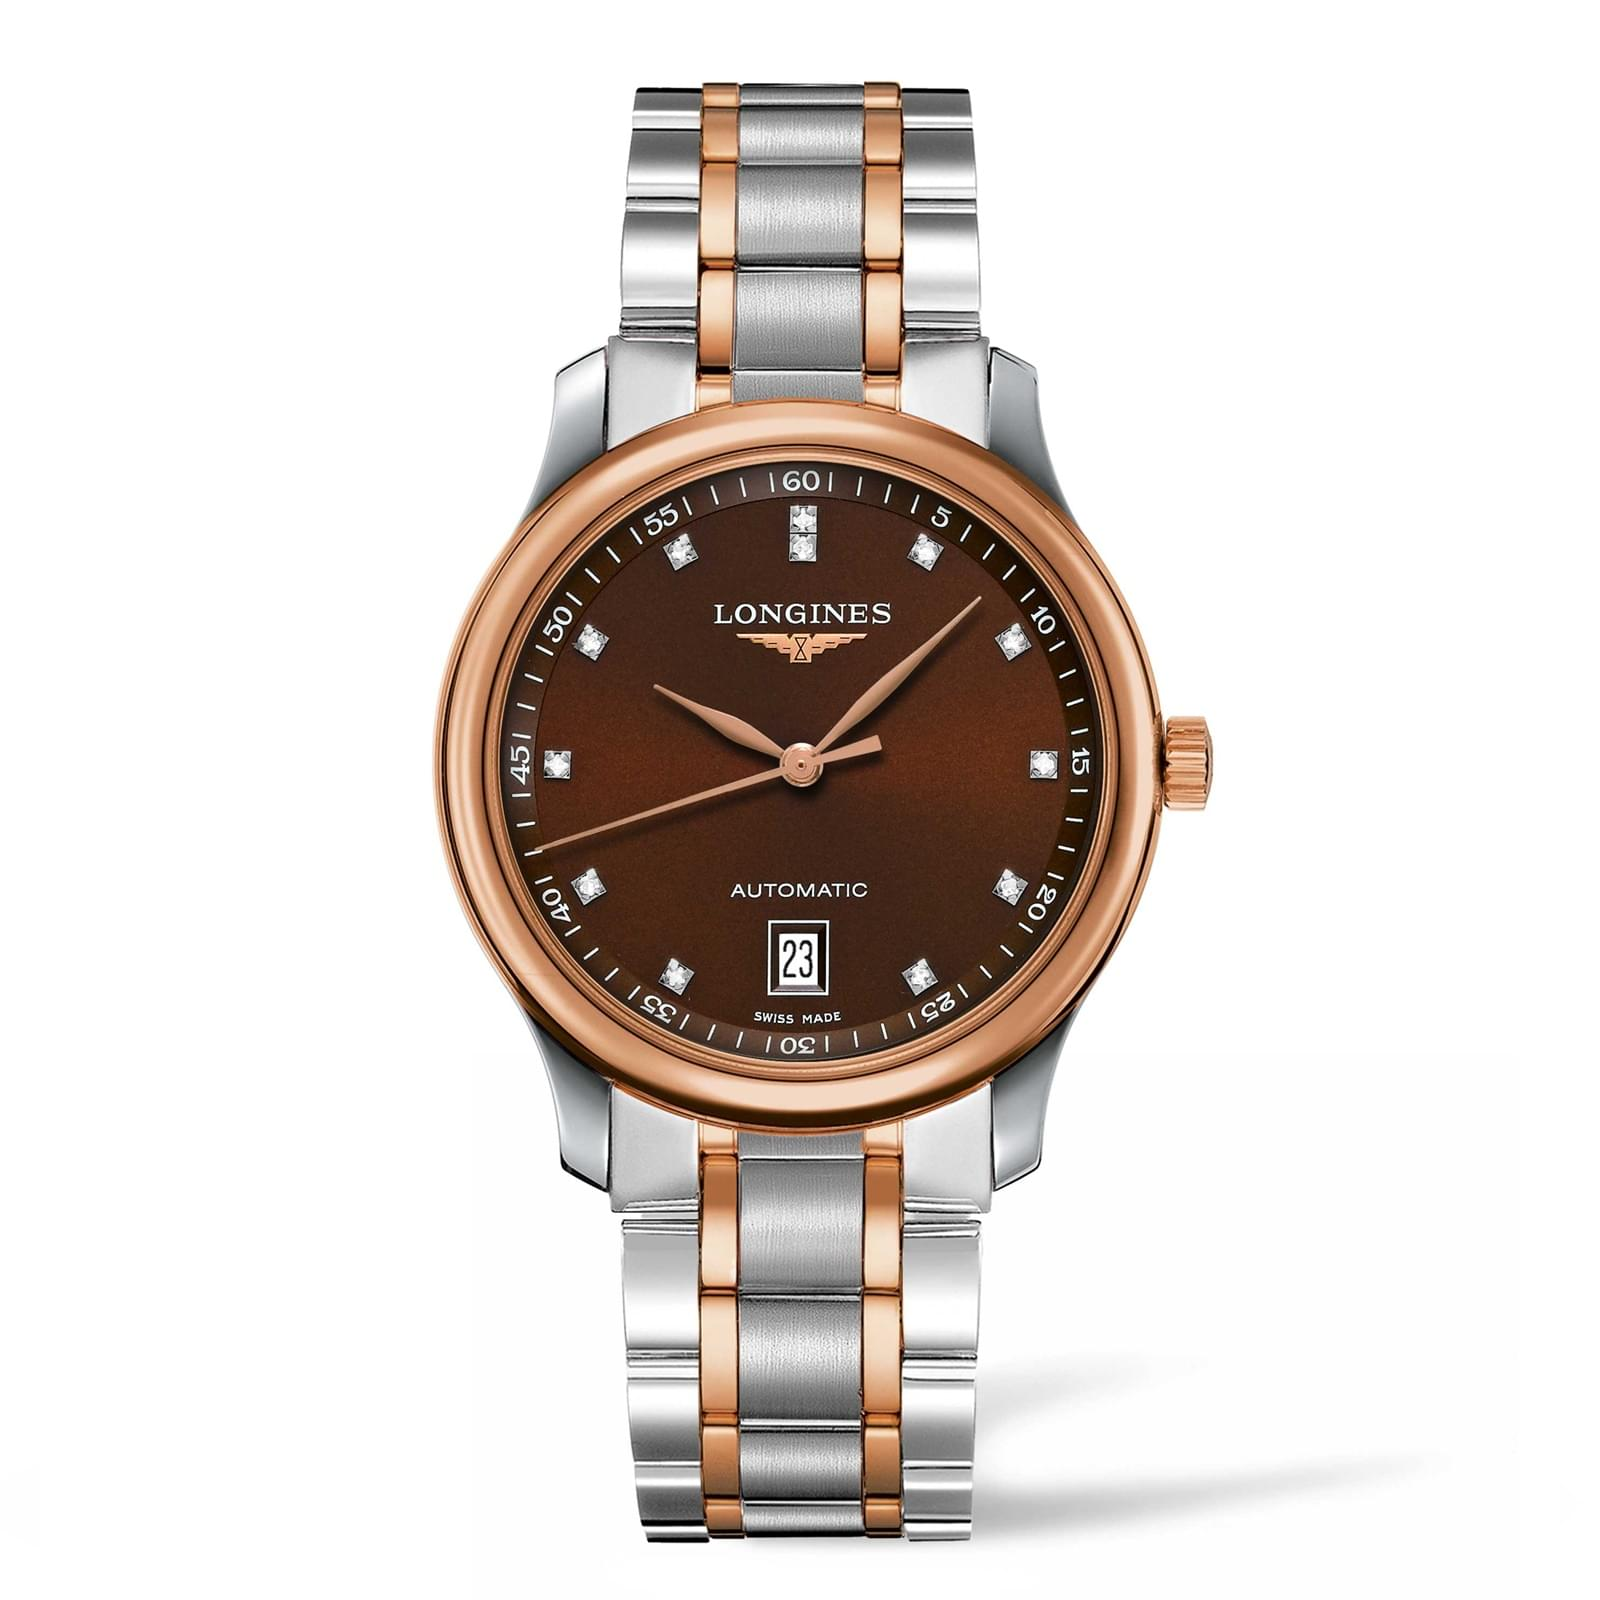 Đồng hồ Longines L2.628.5.67.7